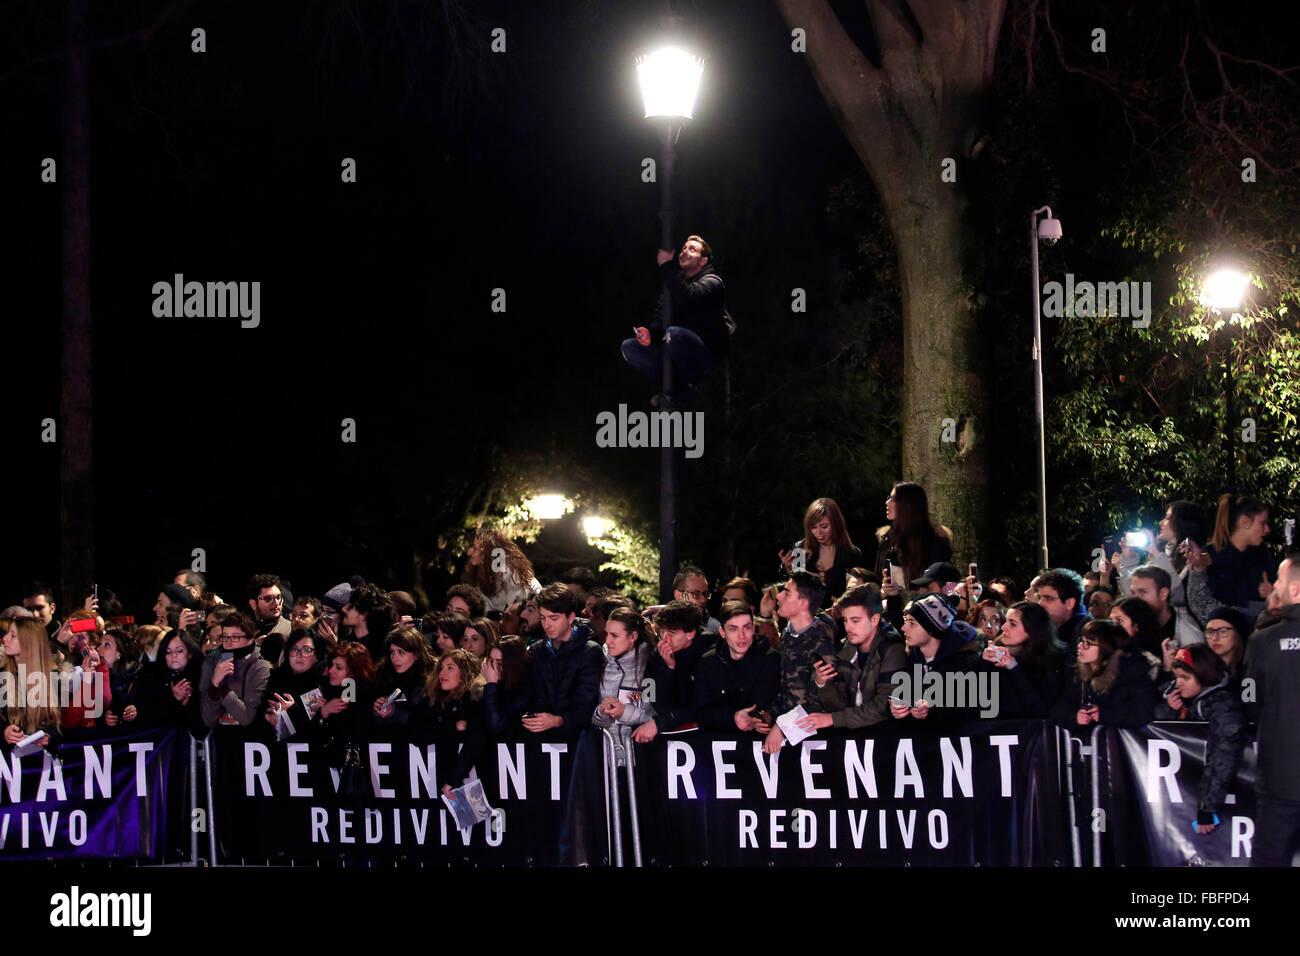 Rom, Italien. 15. Januar 2016. Fans, Casa del Cinema. Redivivo Anteprima. Widergänger Red Carpet Premiere. Stockbild